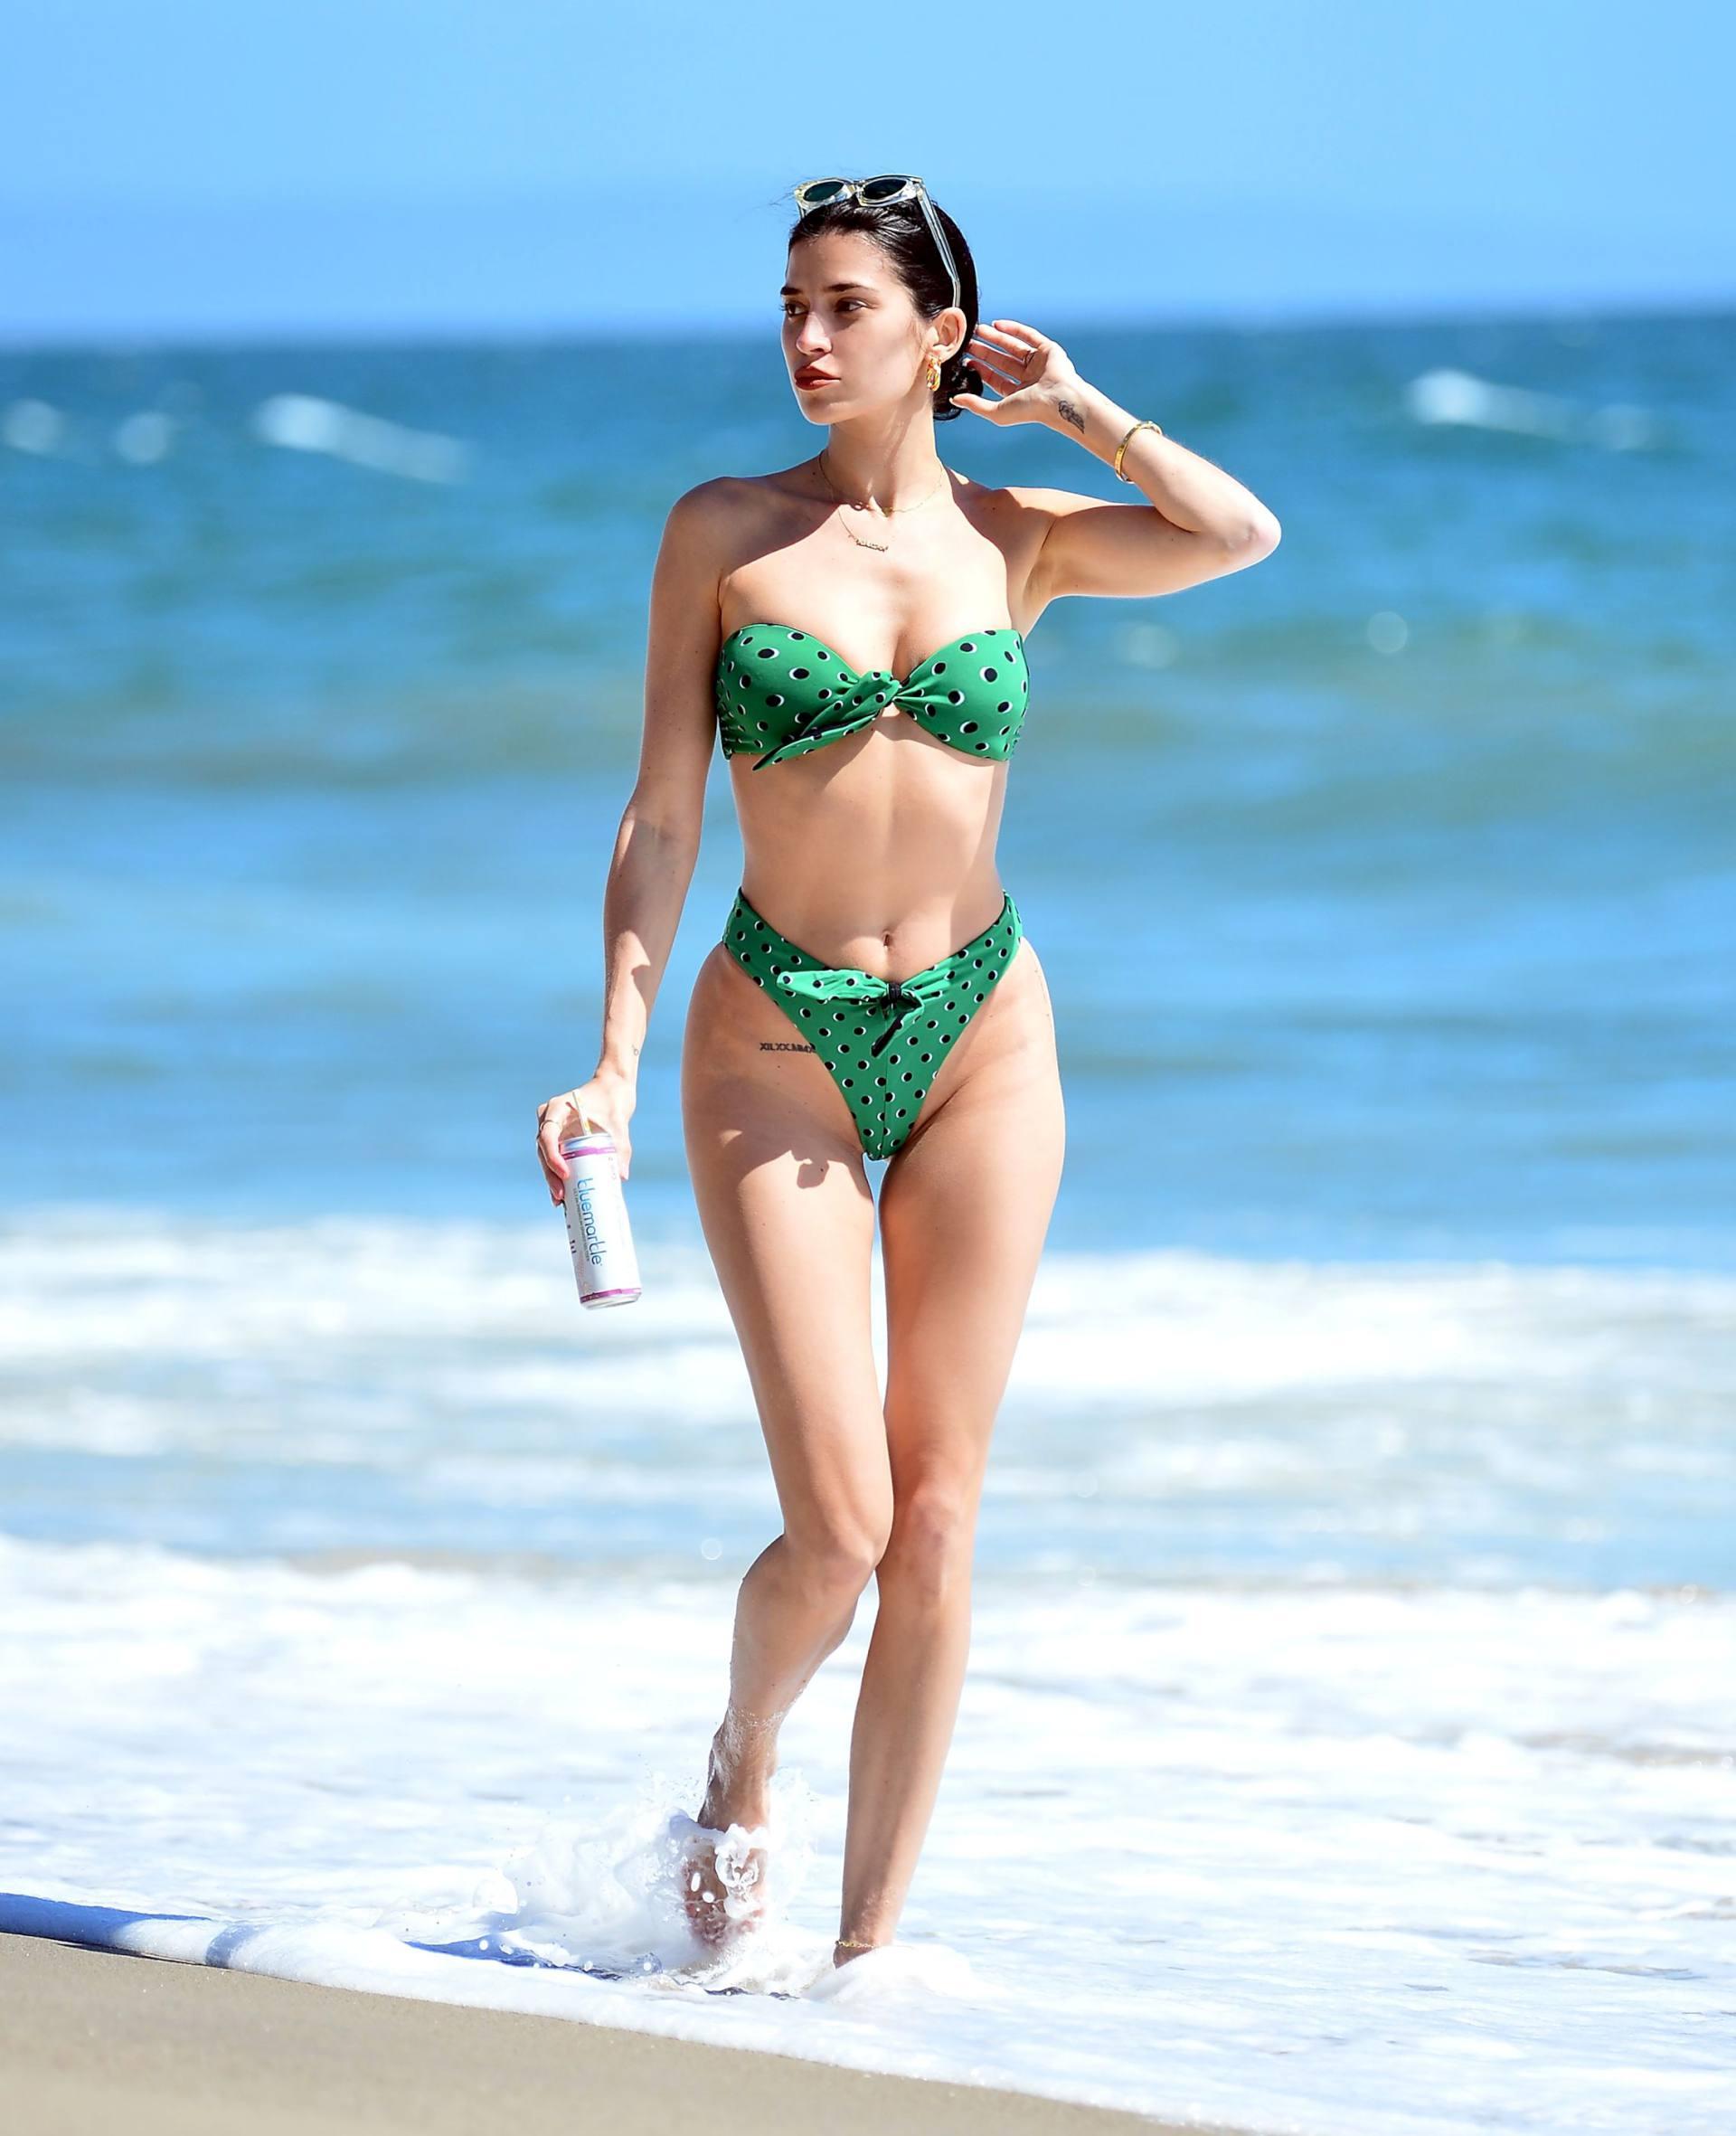 Nicole Williams – Fantastic Body In Skimpy Bikini At The Beach In Malibu 0010